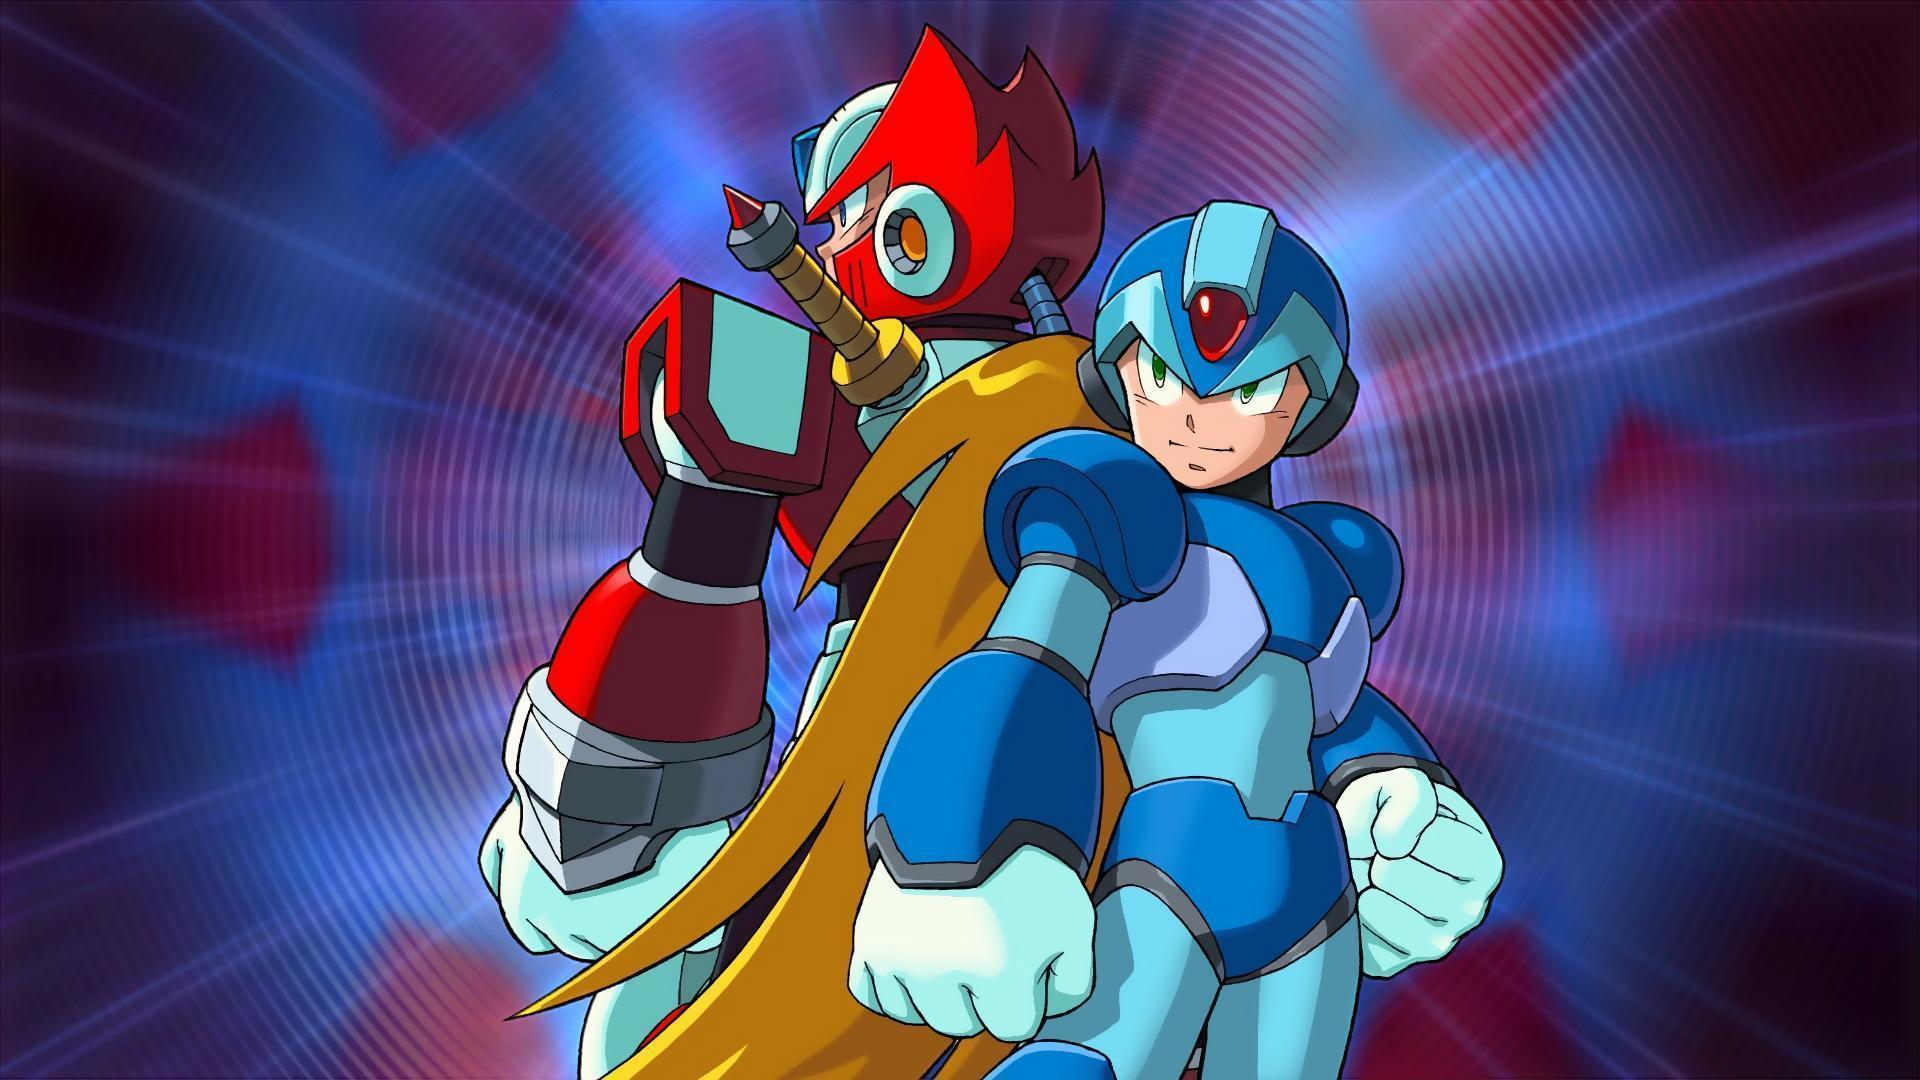 Photo Collection Megaman X Hd Wallpaper